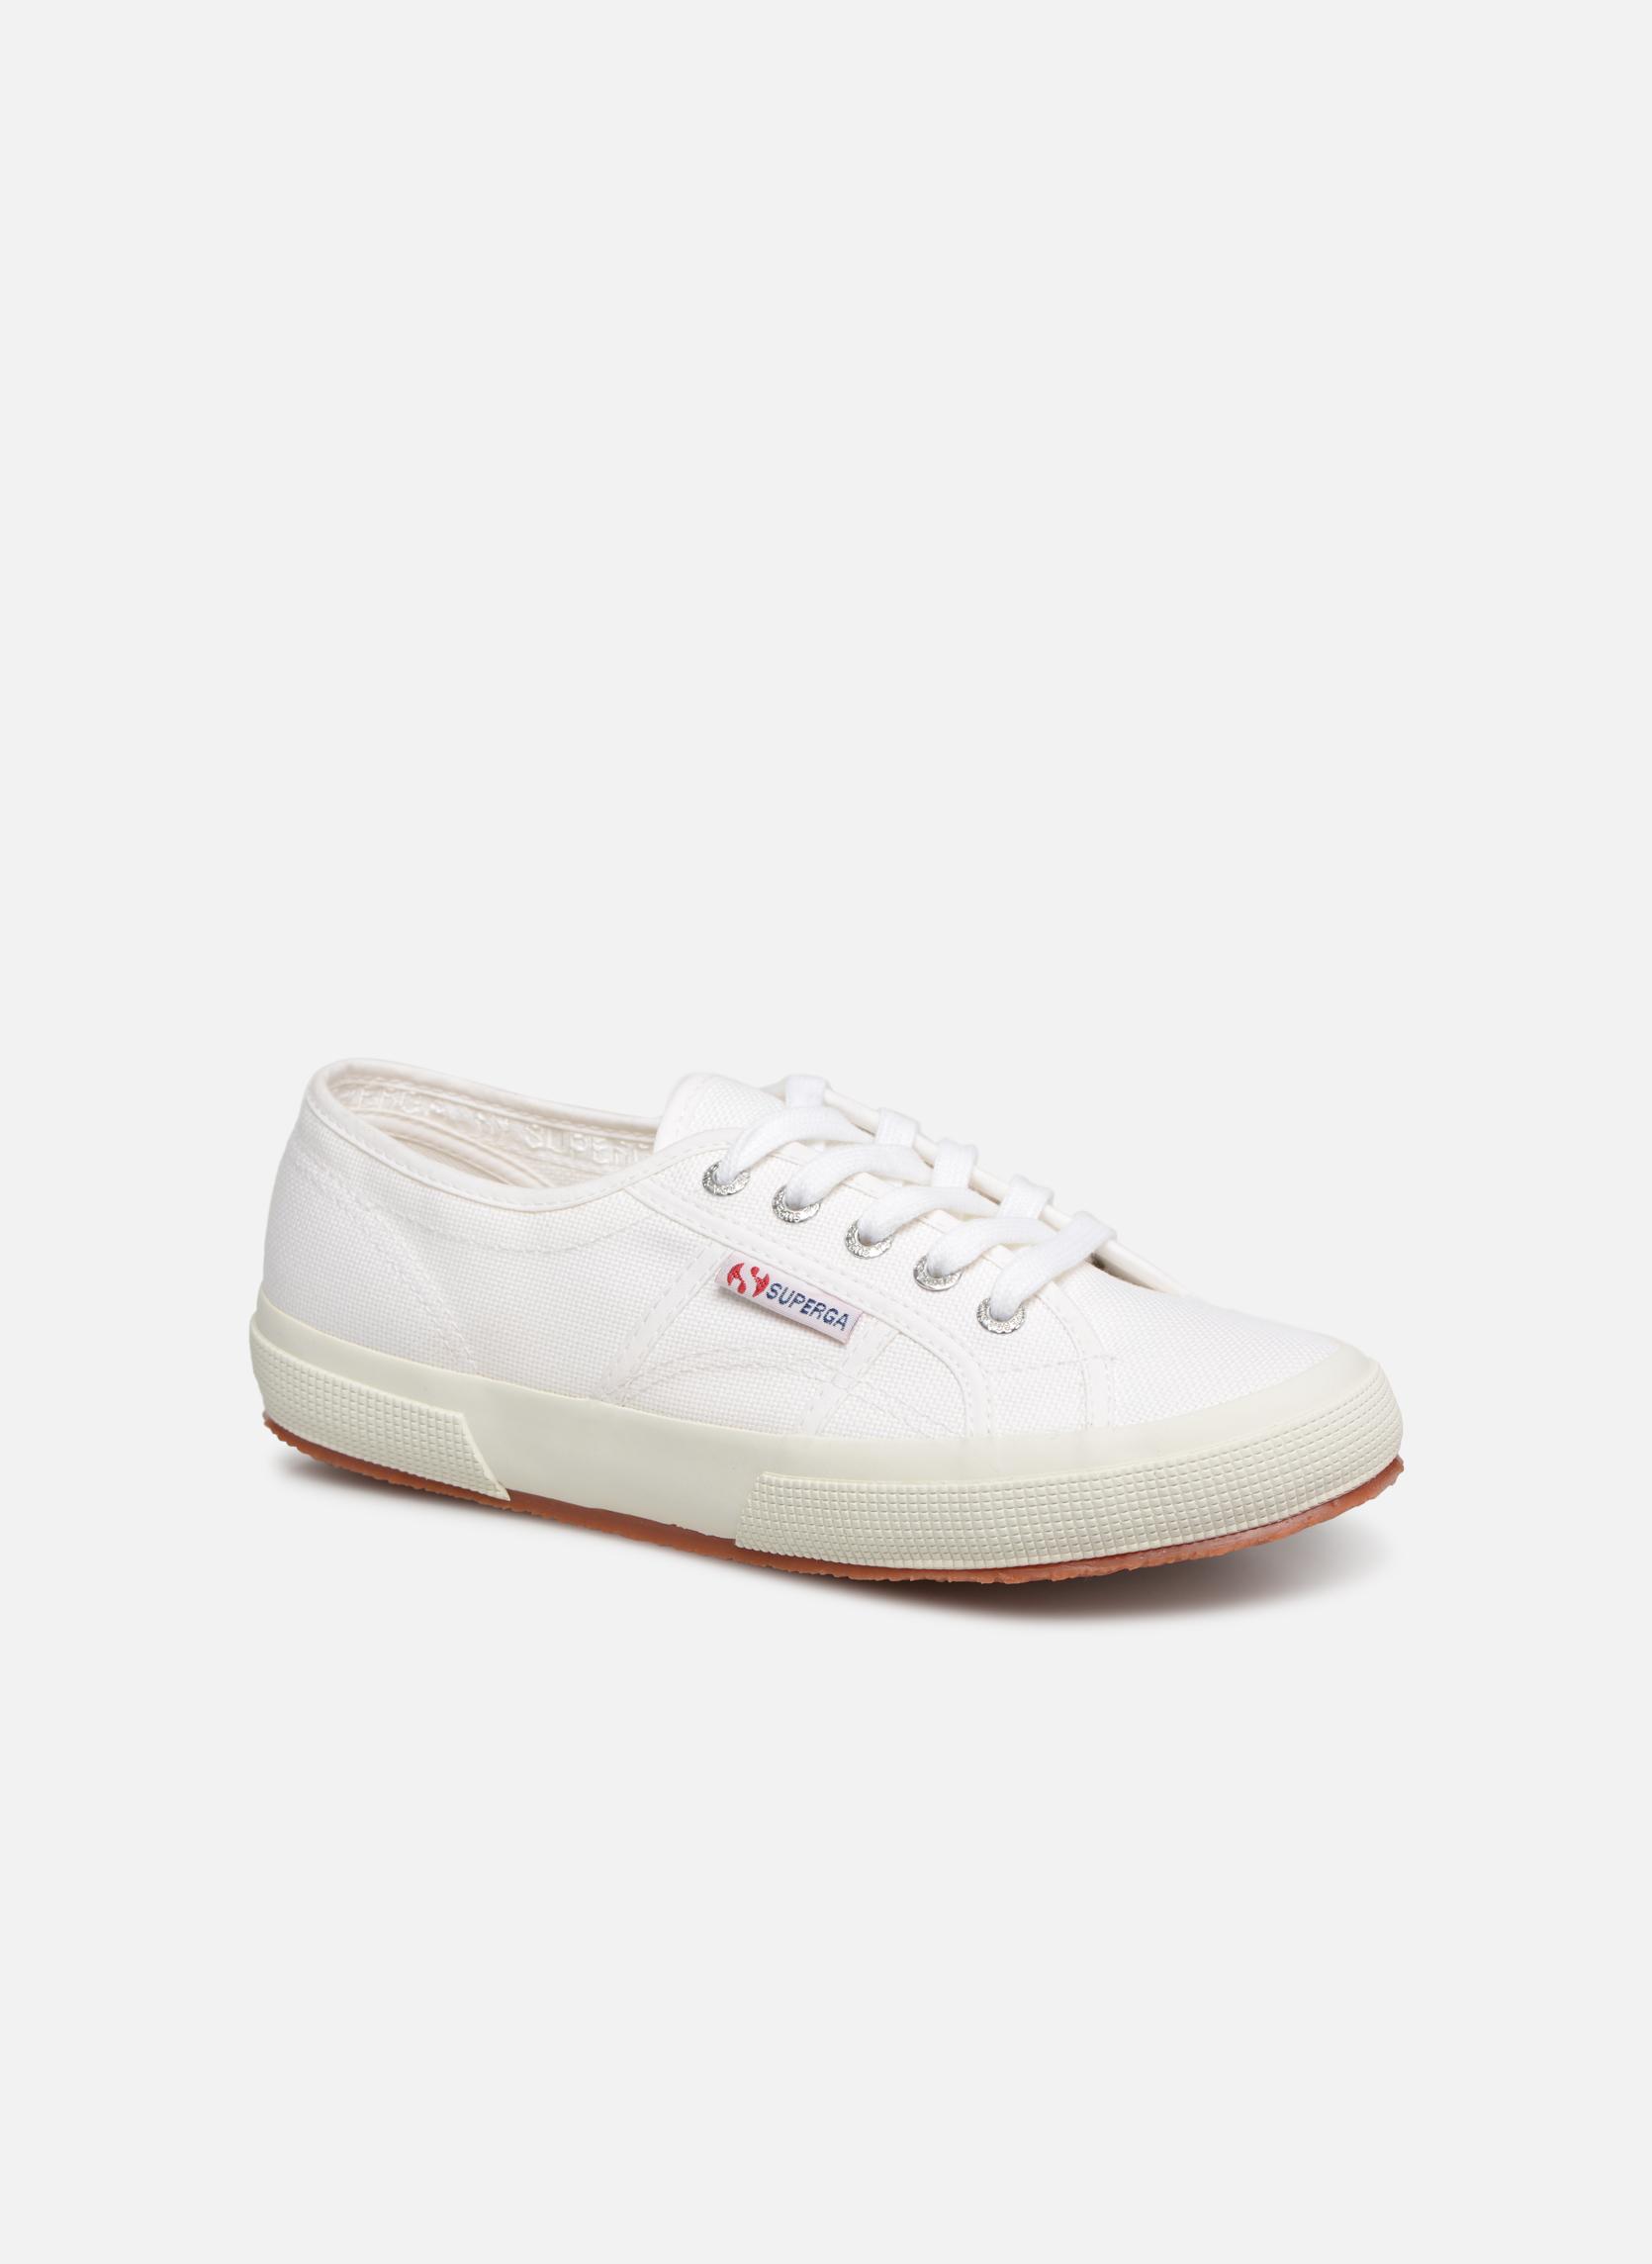 Sneaker Damen 2750 Cotu W